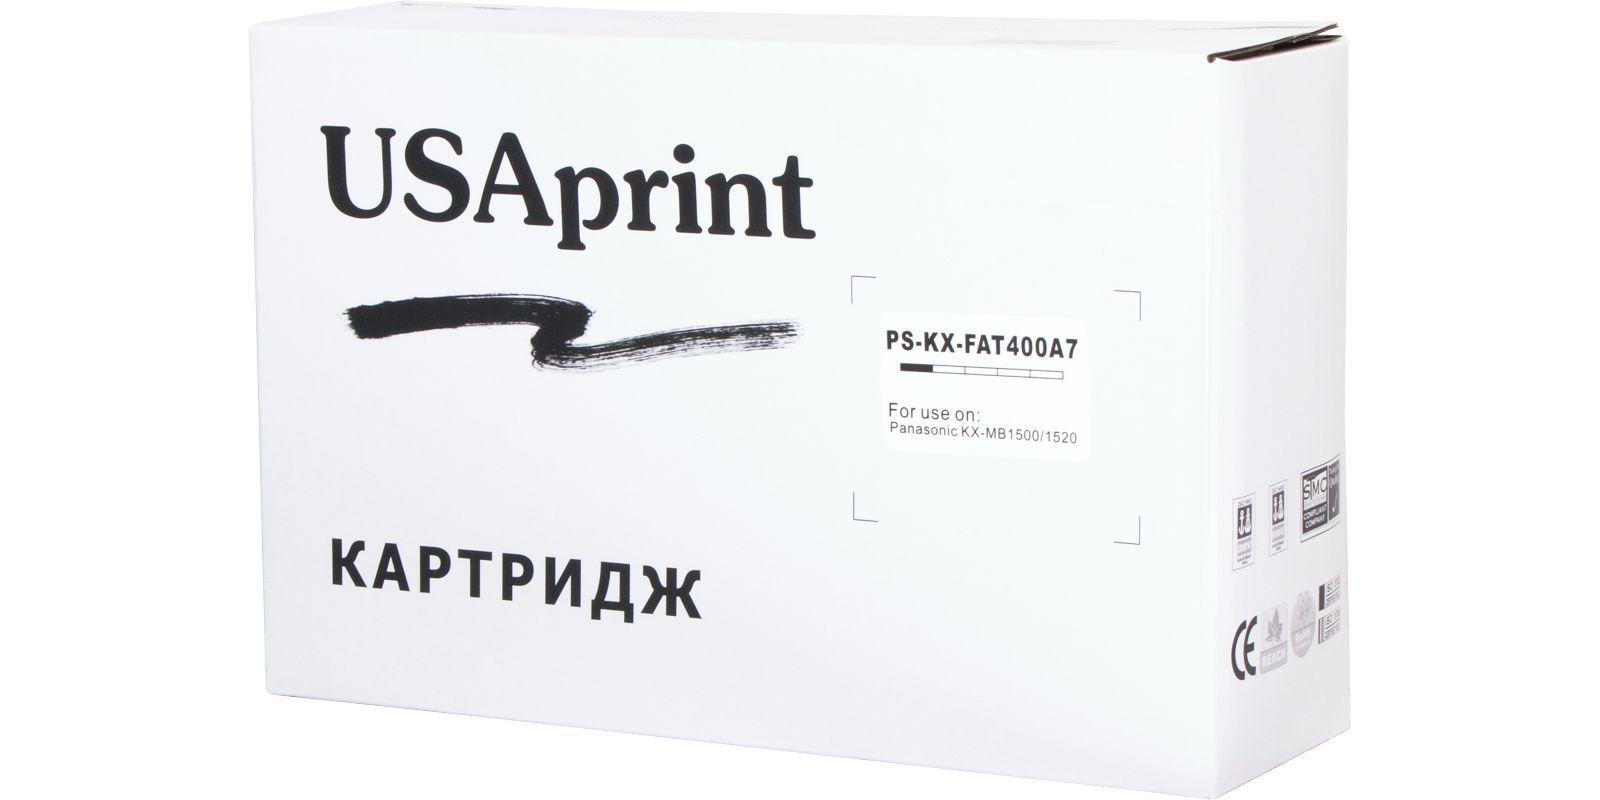 USAprint KX-FAT400A, черный, для Panasonic, до 1800 стр.